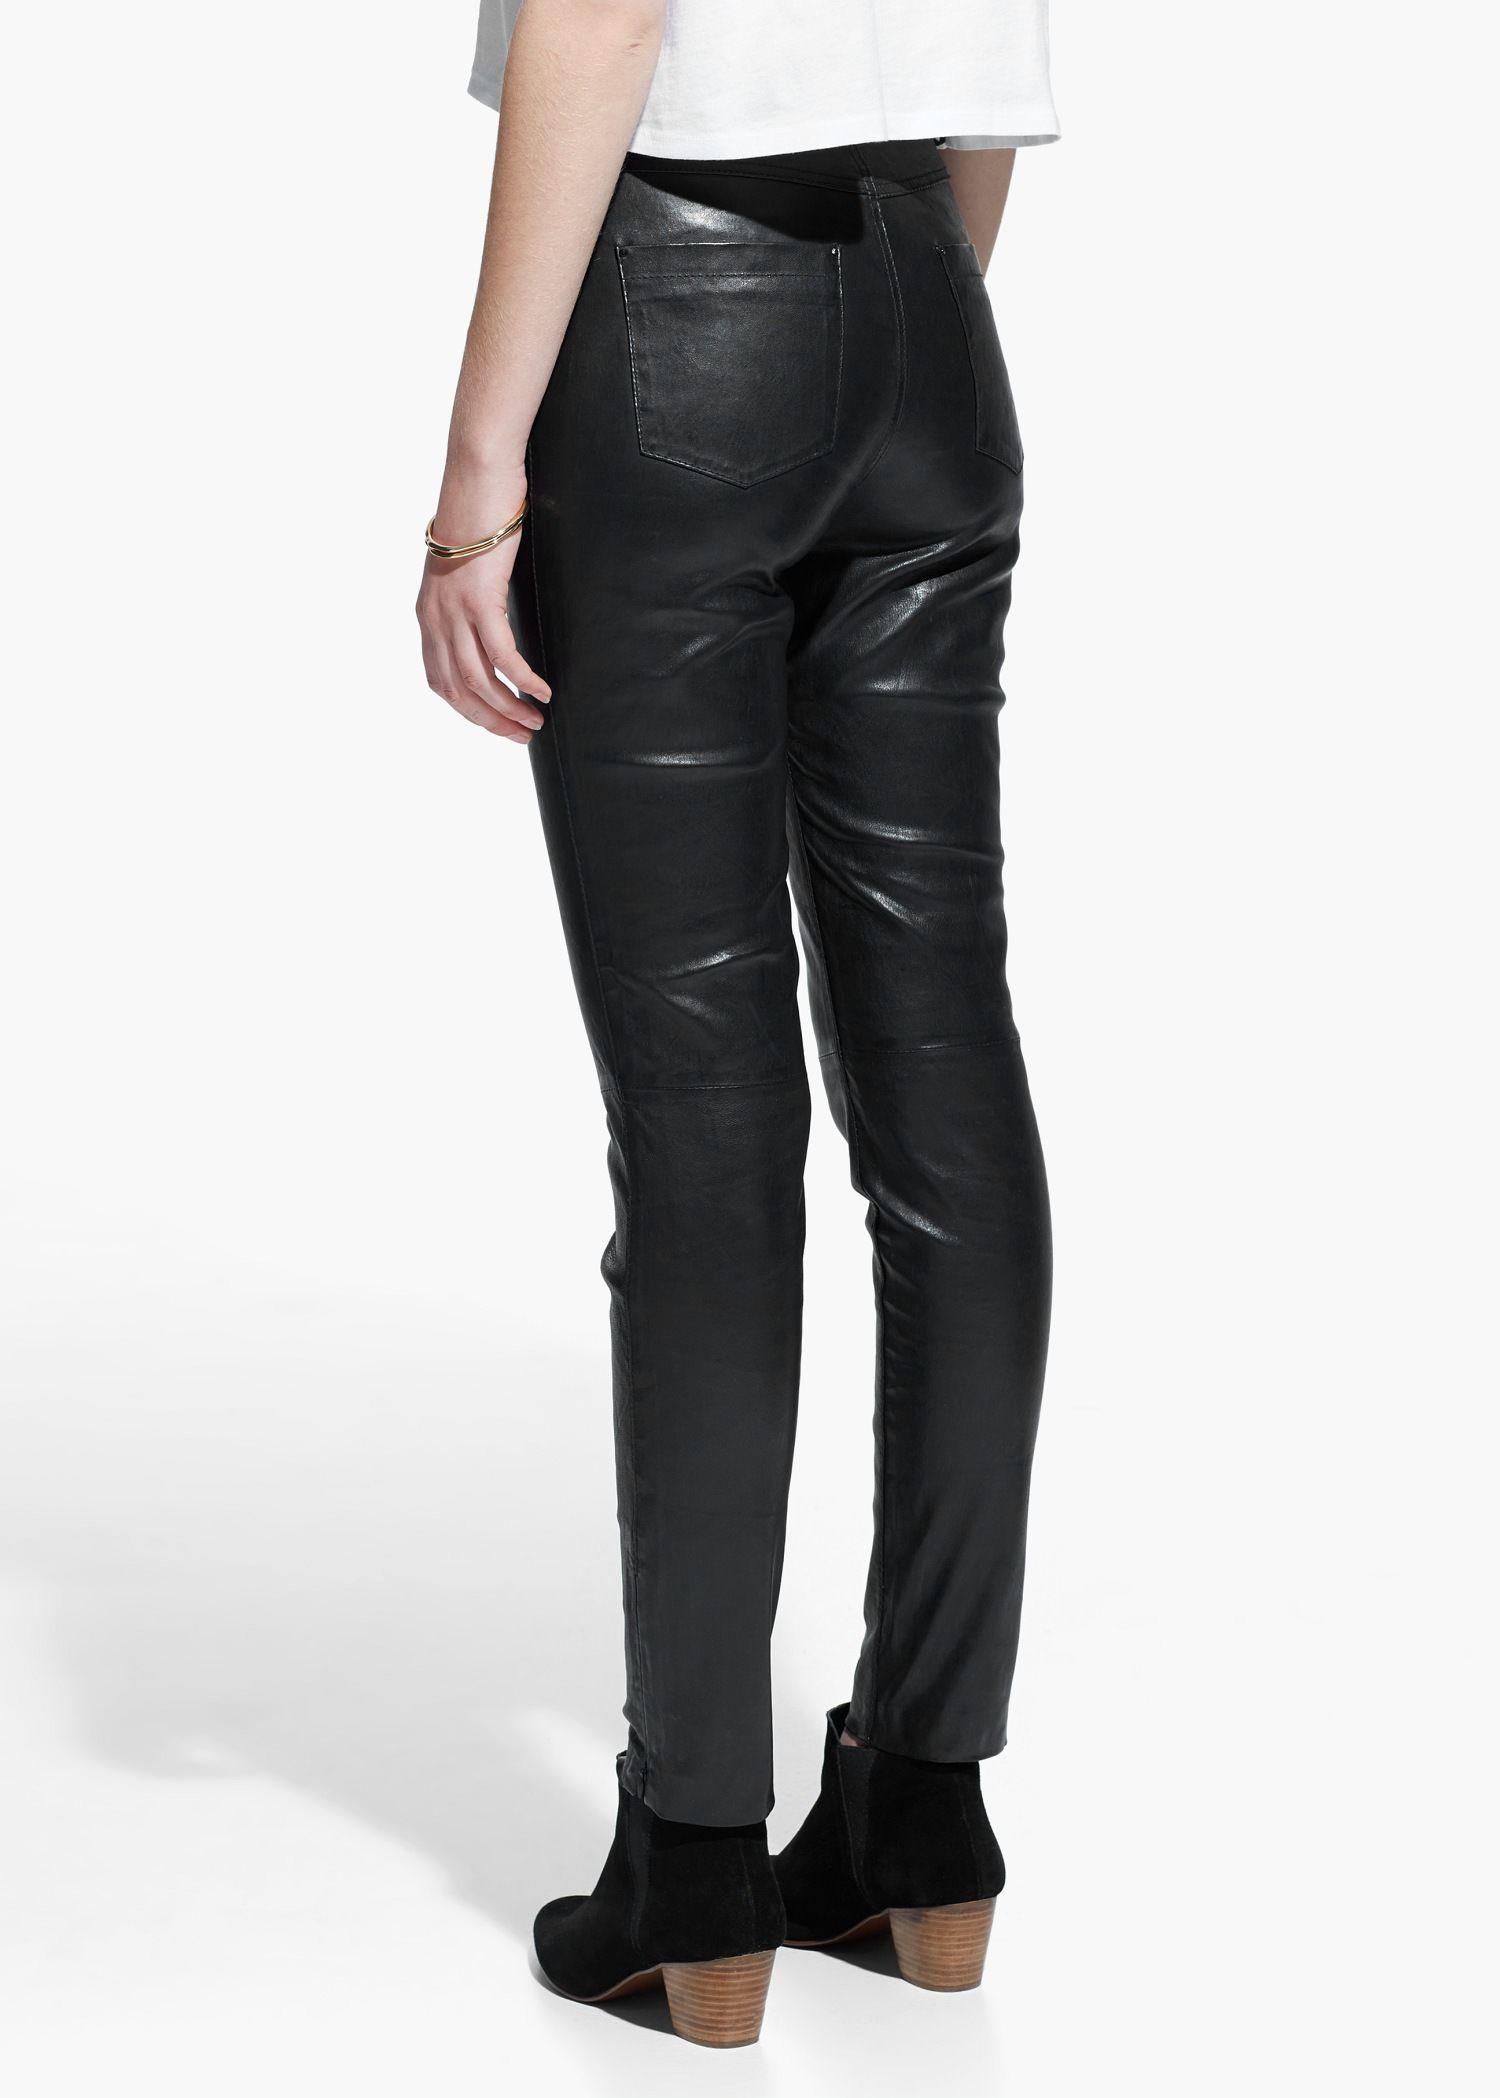 3beb3d98d Pantalón alto piel - Mujer